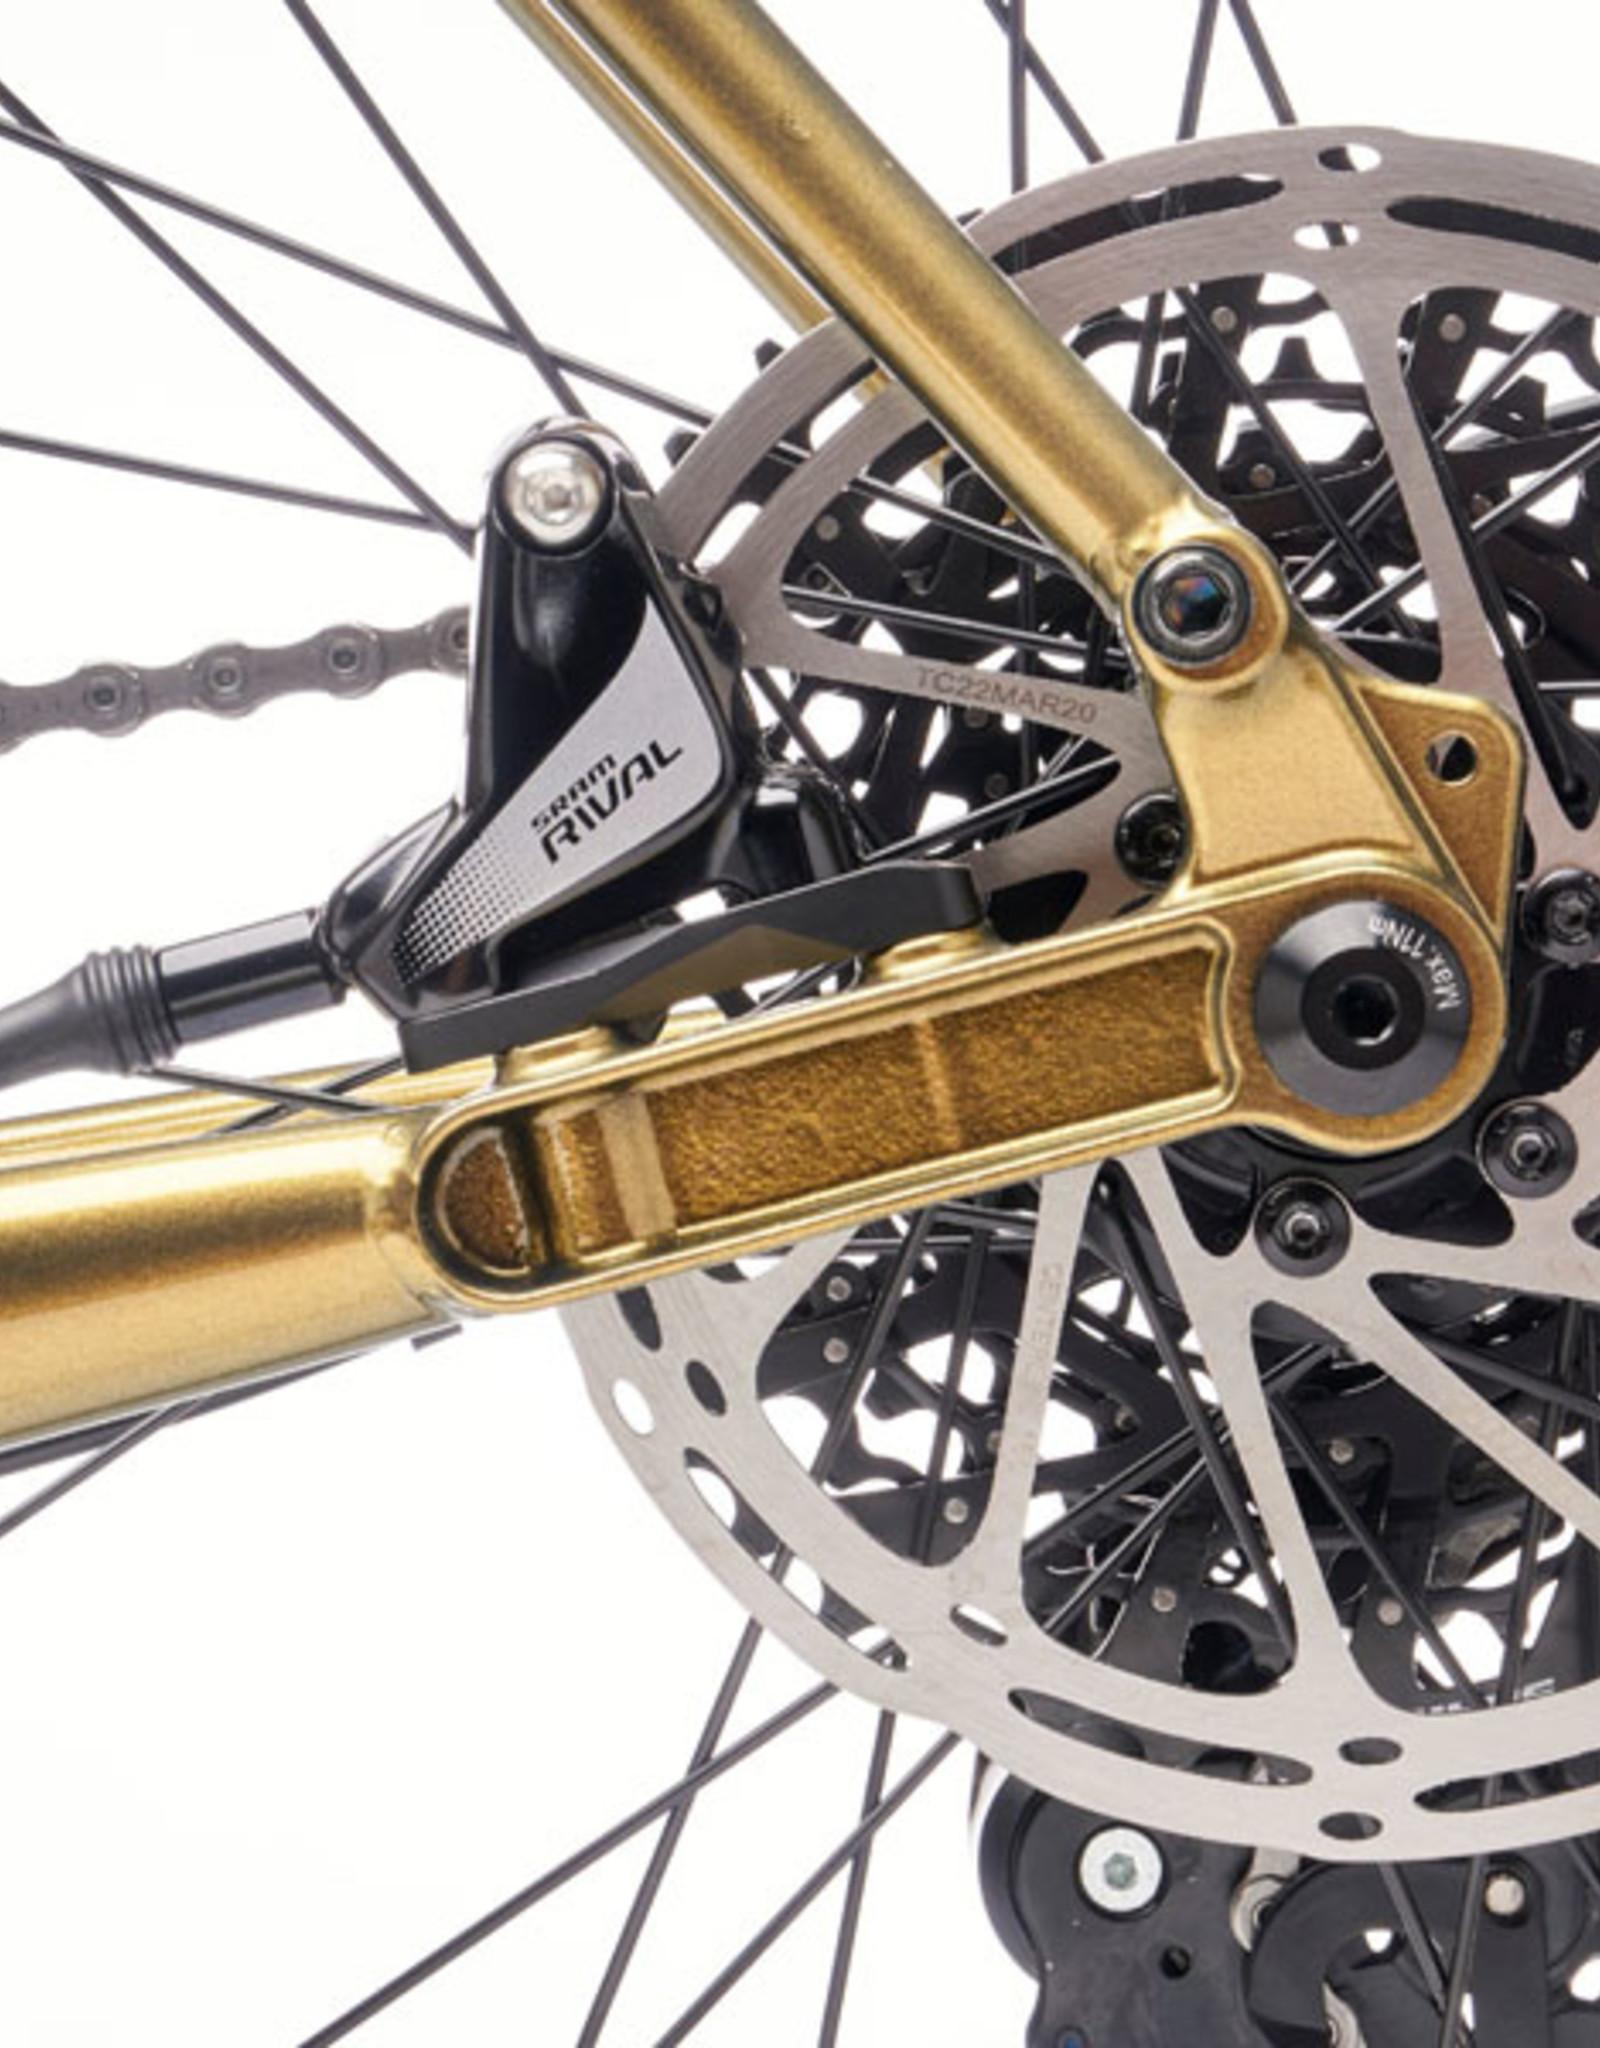 Kona Bicycles Kona Sutra LTD (Metallic Champagne) 2021